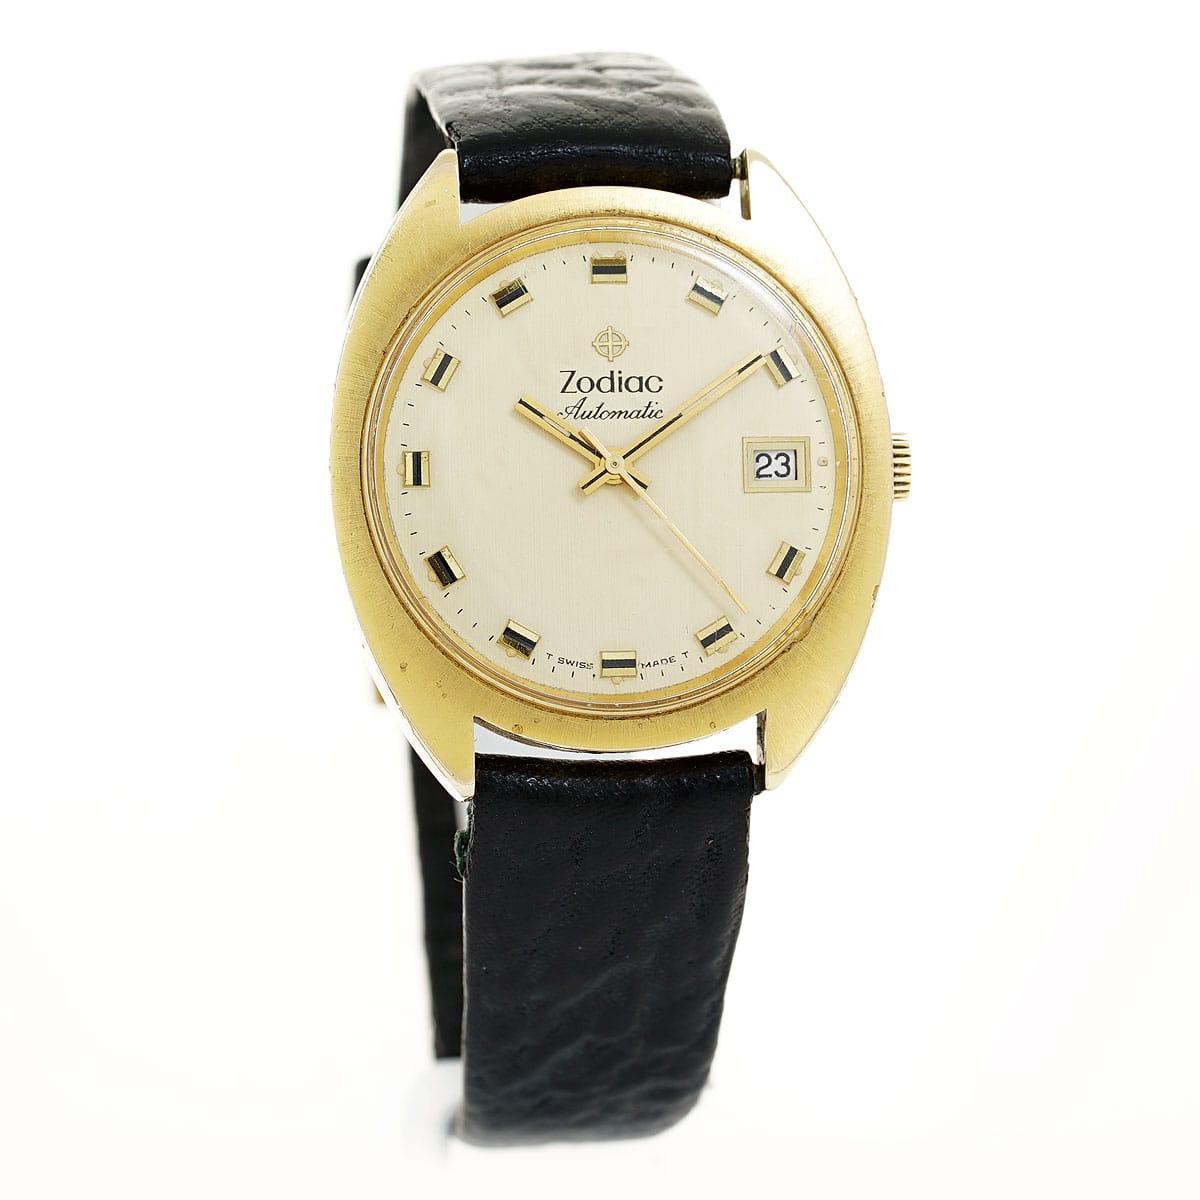 111982-montre-zodiac-occasion-lionel-meylan-vevey